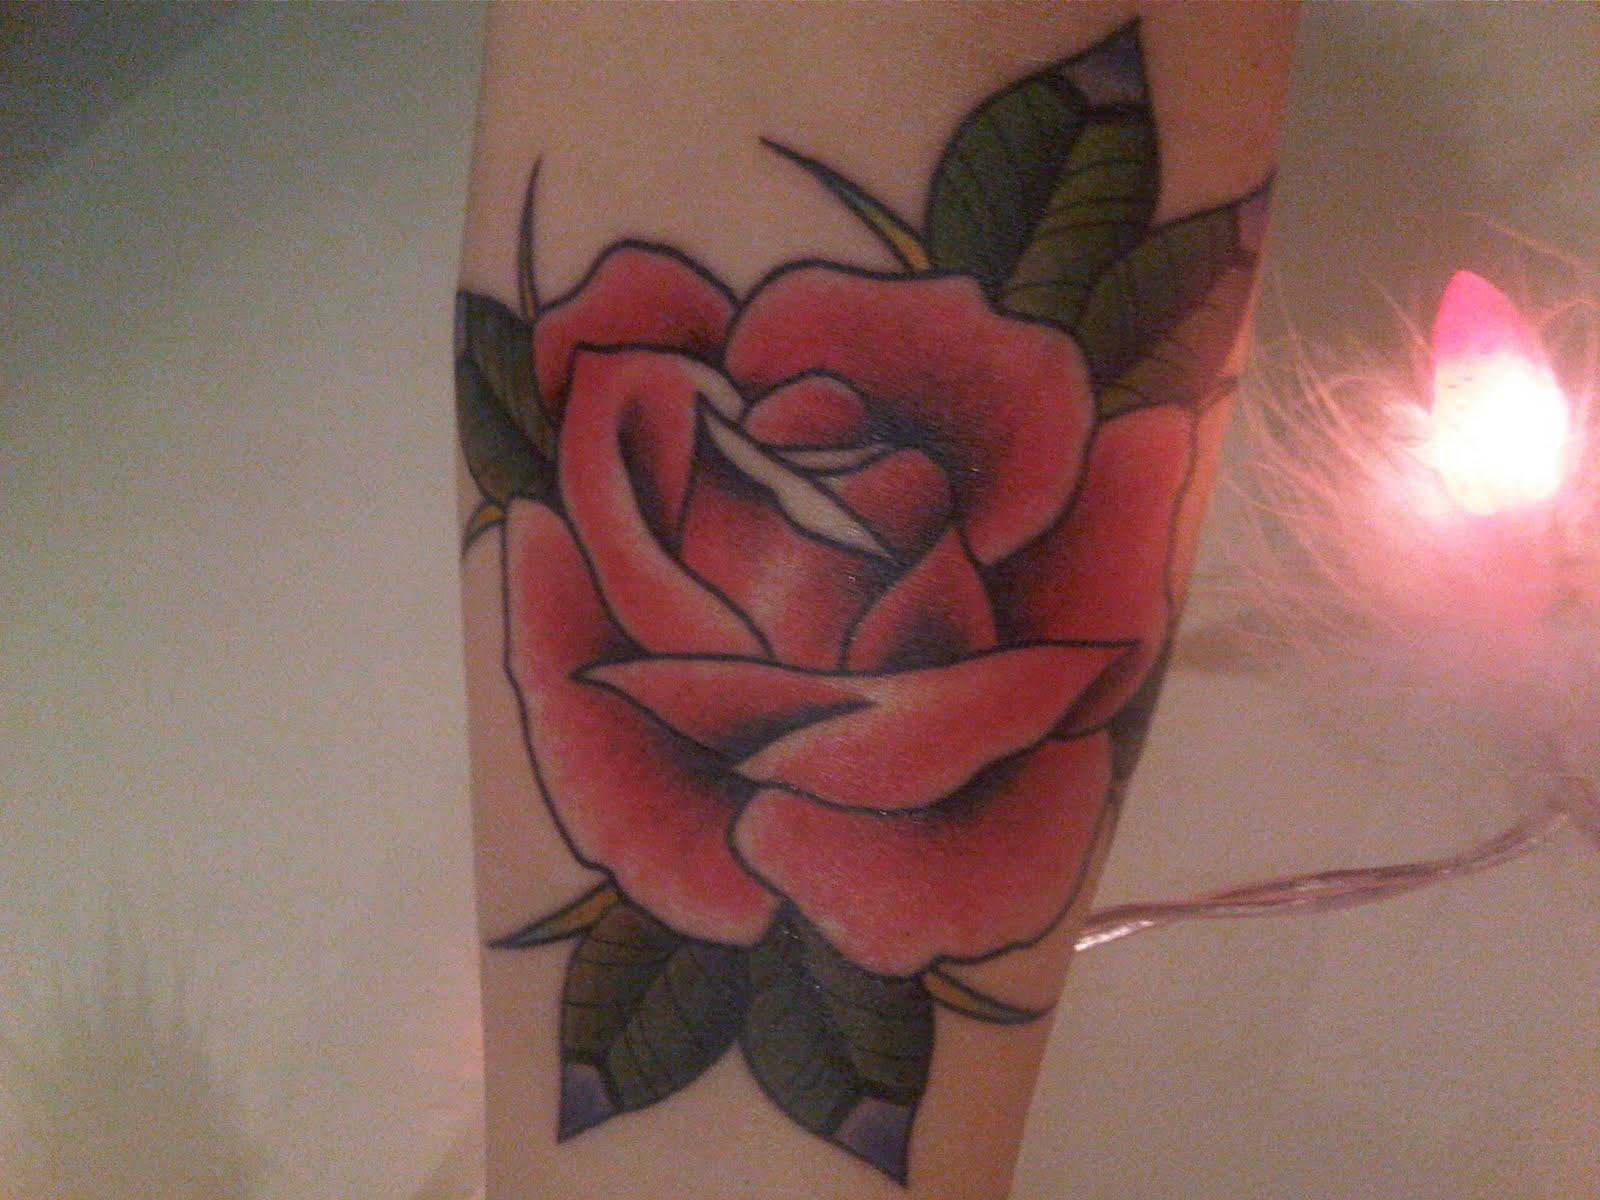 http://2.bp.blogspot.com/_vdy5PdGb6vw/TEhtMeOKZ7I/AAAAAAAACI4/YroaGJqdZ5o/s1600/tattoo+2.jpg